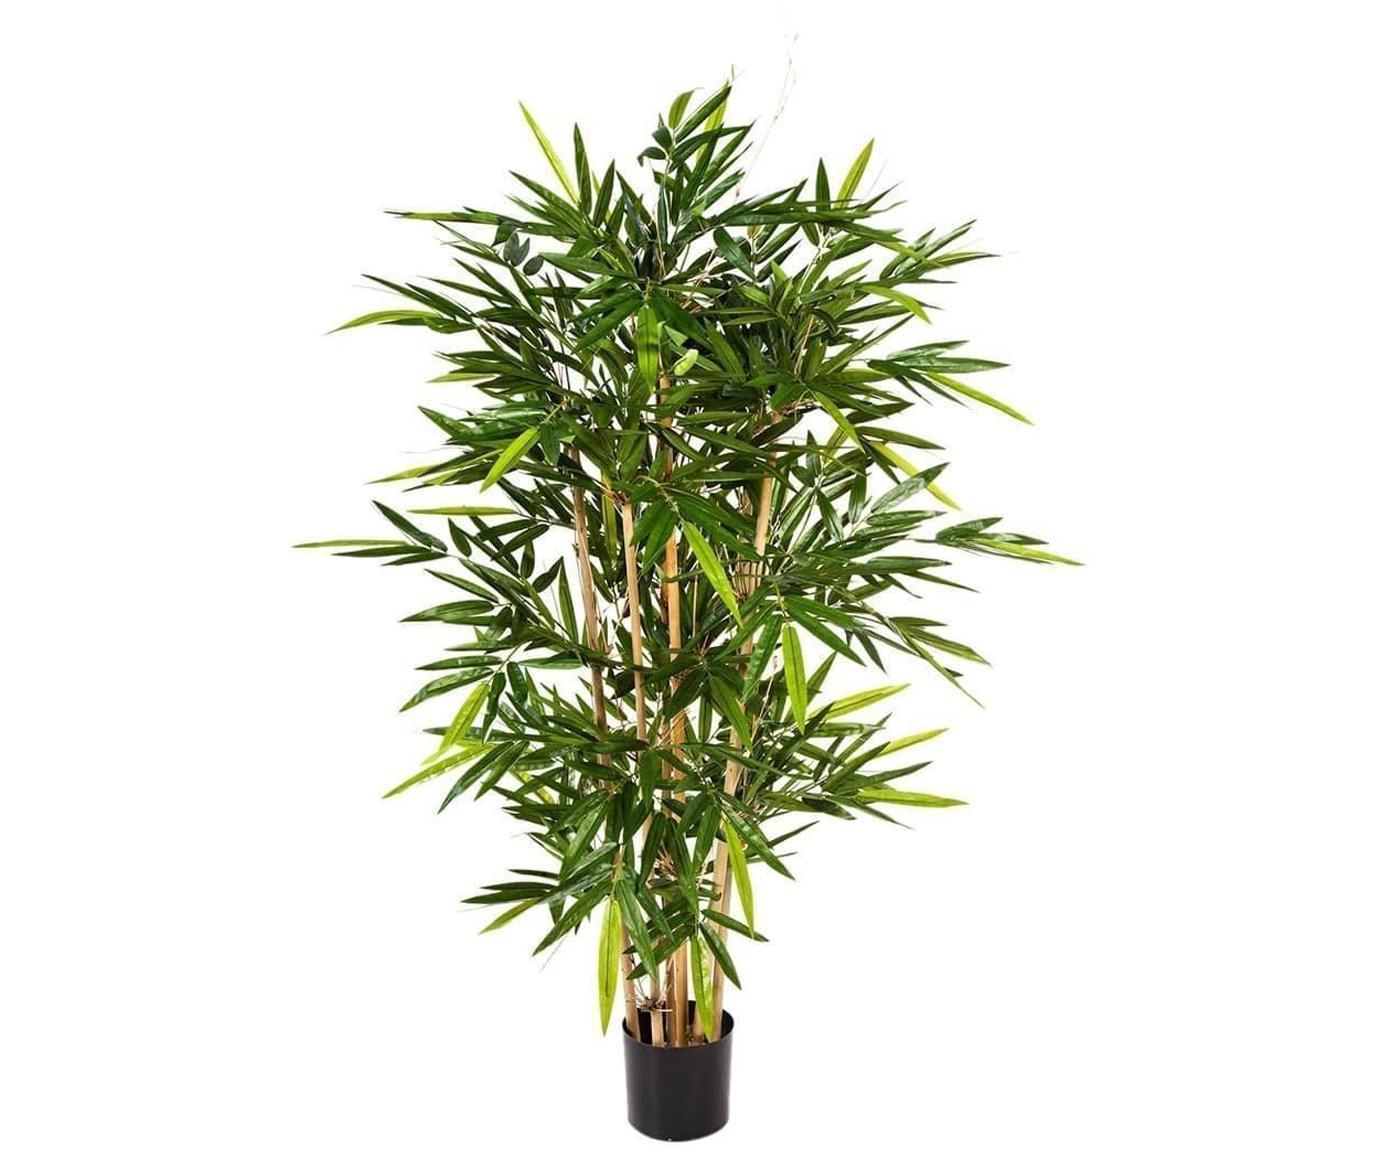 Planta artificial Bamboo, Poliéster, troncos de materiales naturales, Verde, marrón, Ø 45 x Al 120 cm